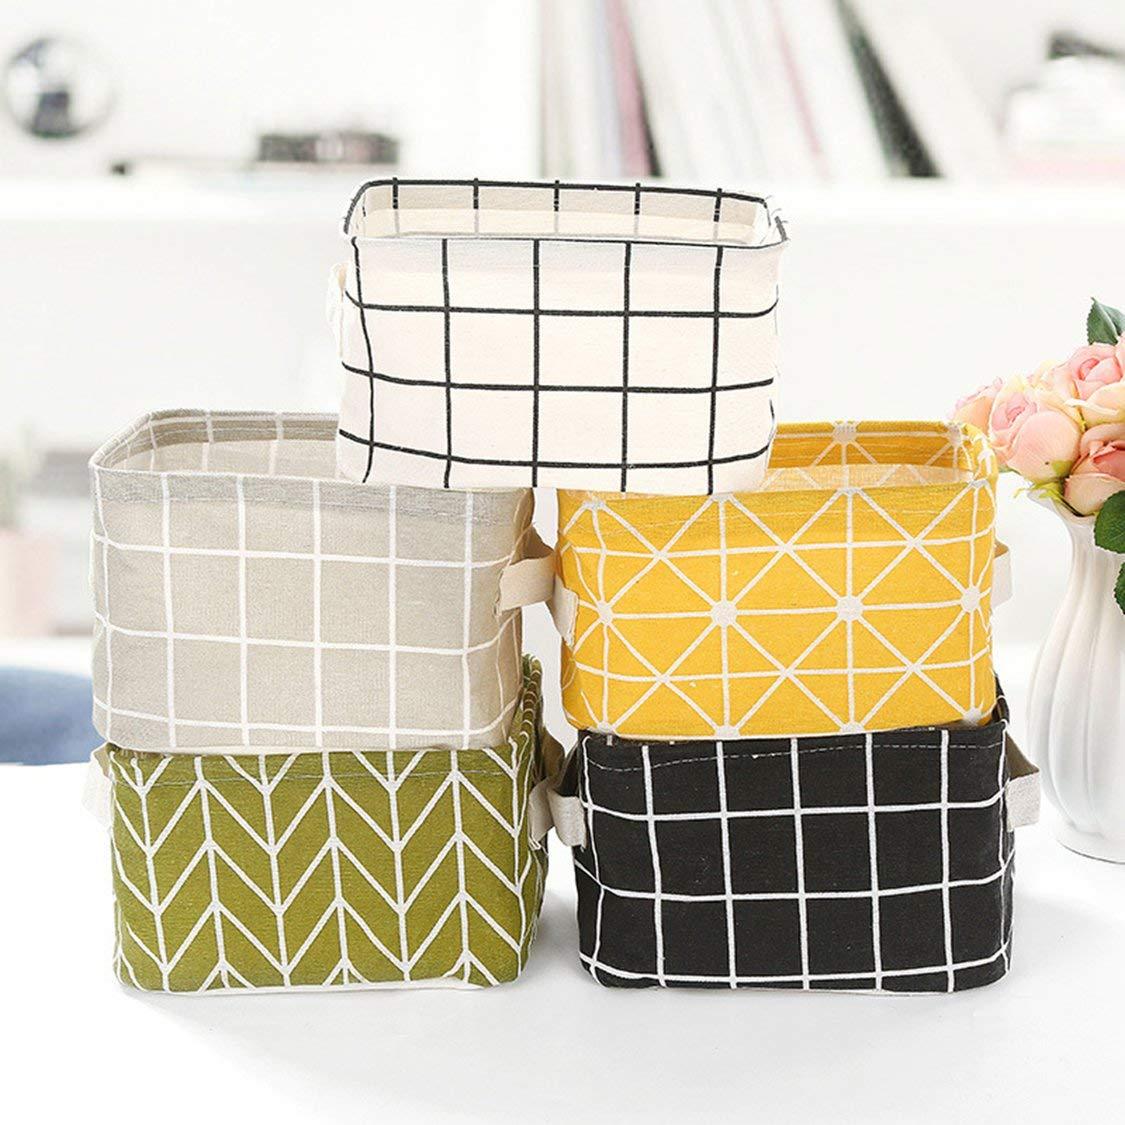 Fabric Storage Basket Large Basket for Toy Washing Basket Dirty Clothes Sundries Home Storage Baskets Box